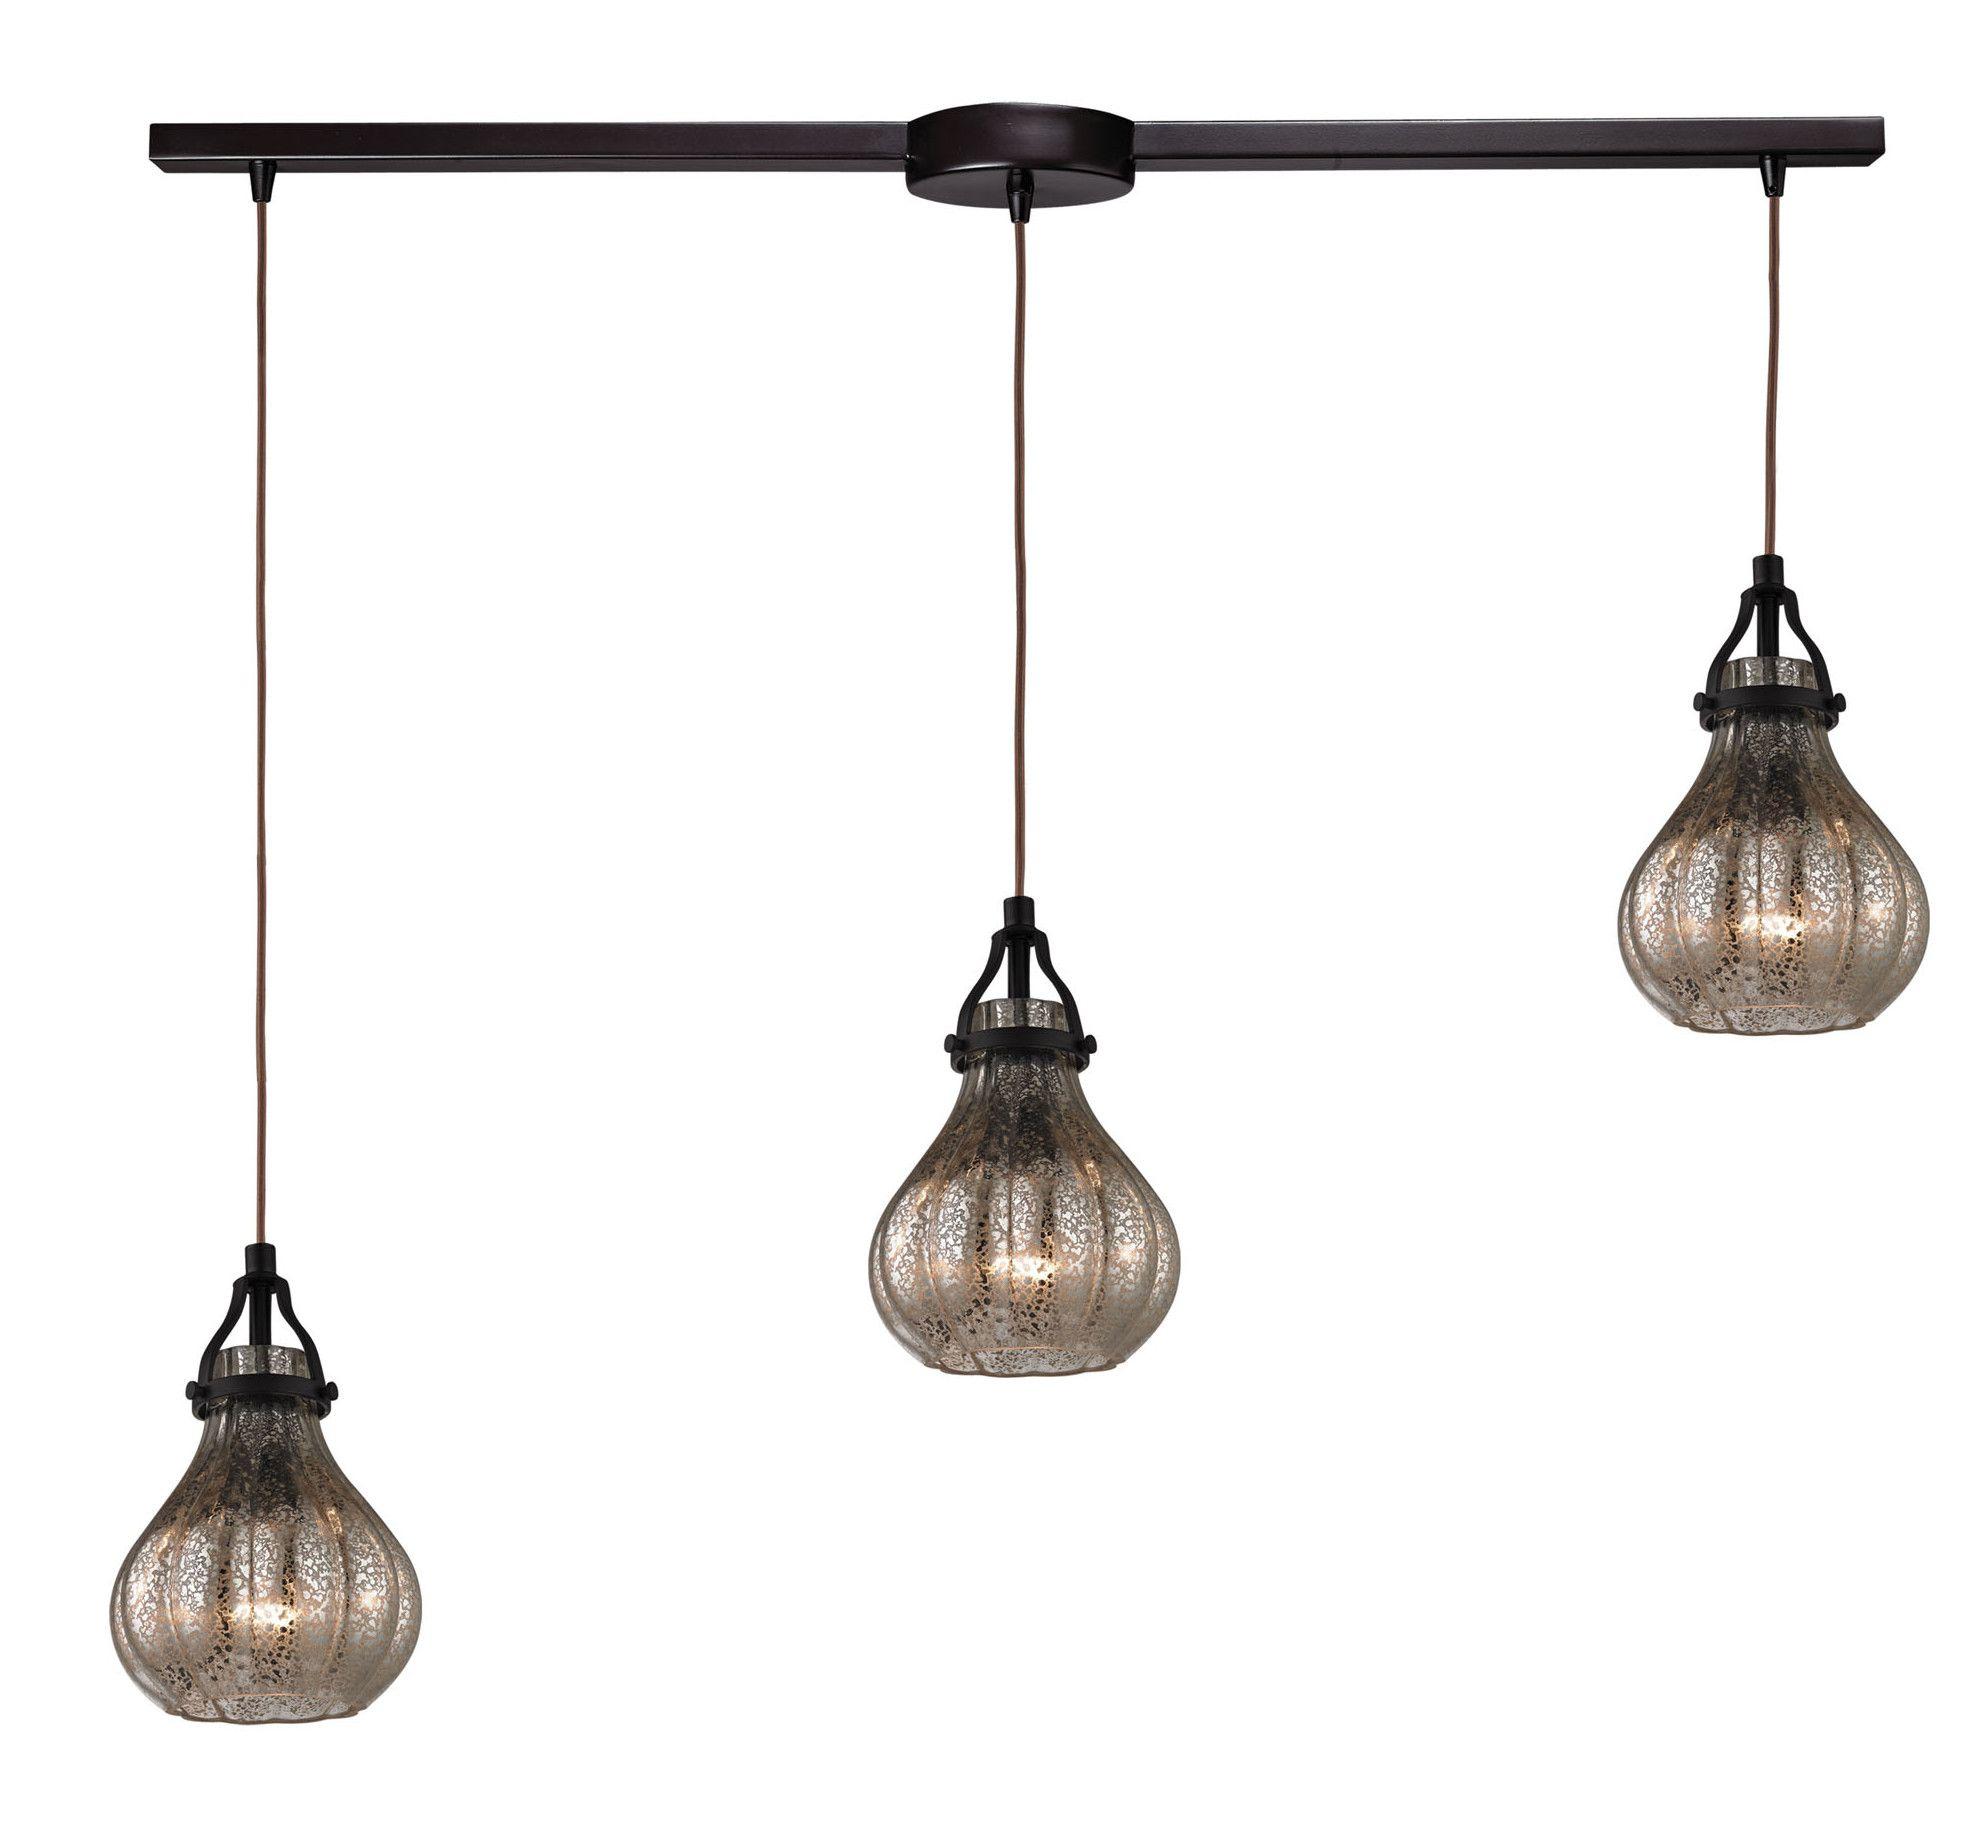 3 Light Pendant Island Kitchen Lighting Orofino 3 Light Kitchen Island Pendant Products Pinterest